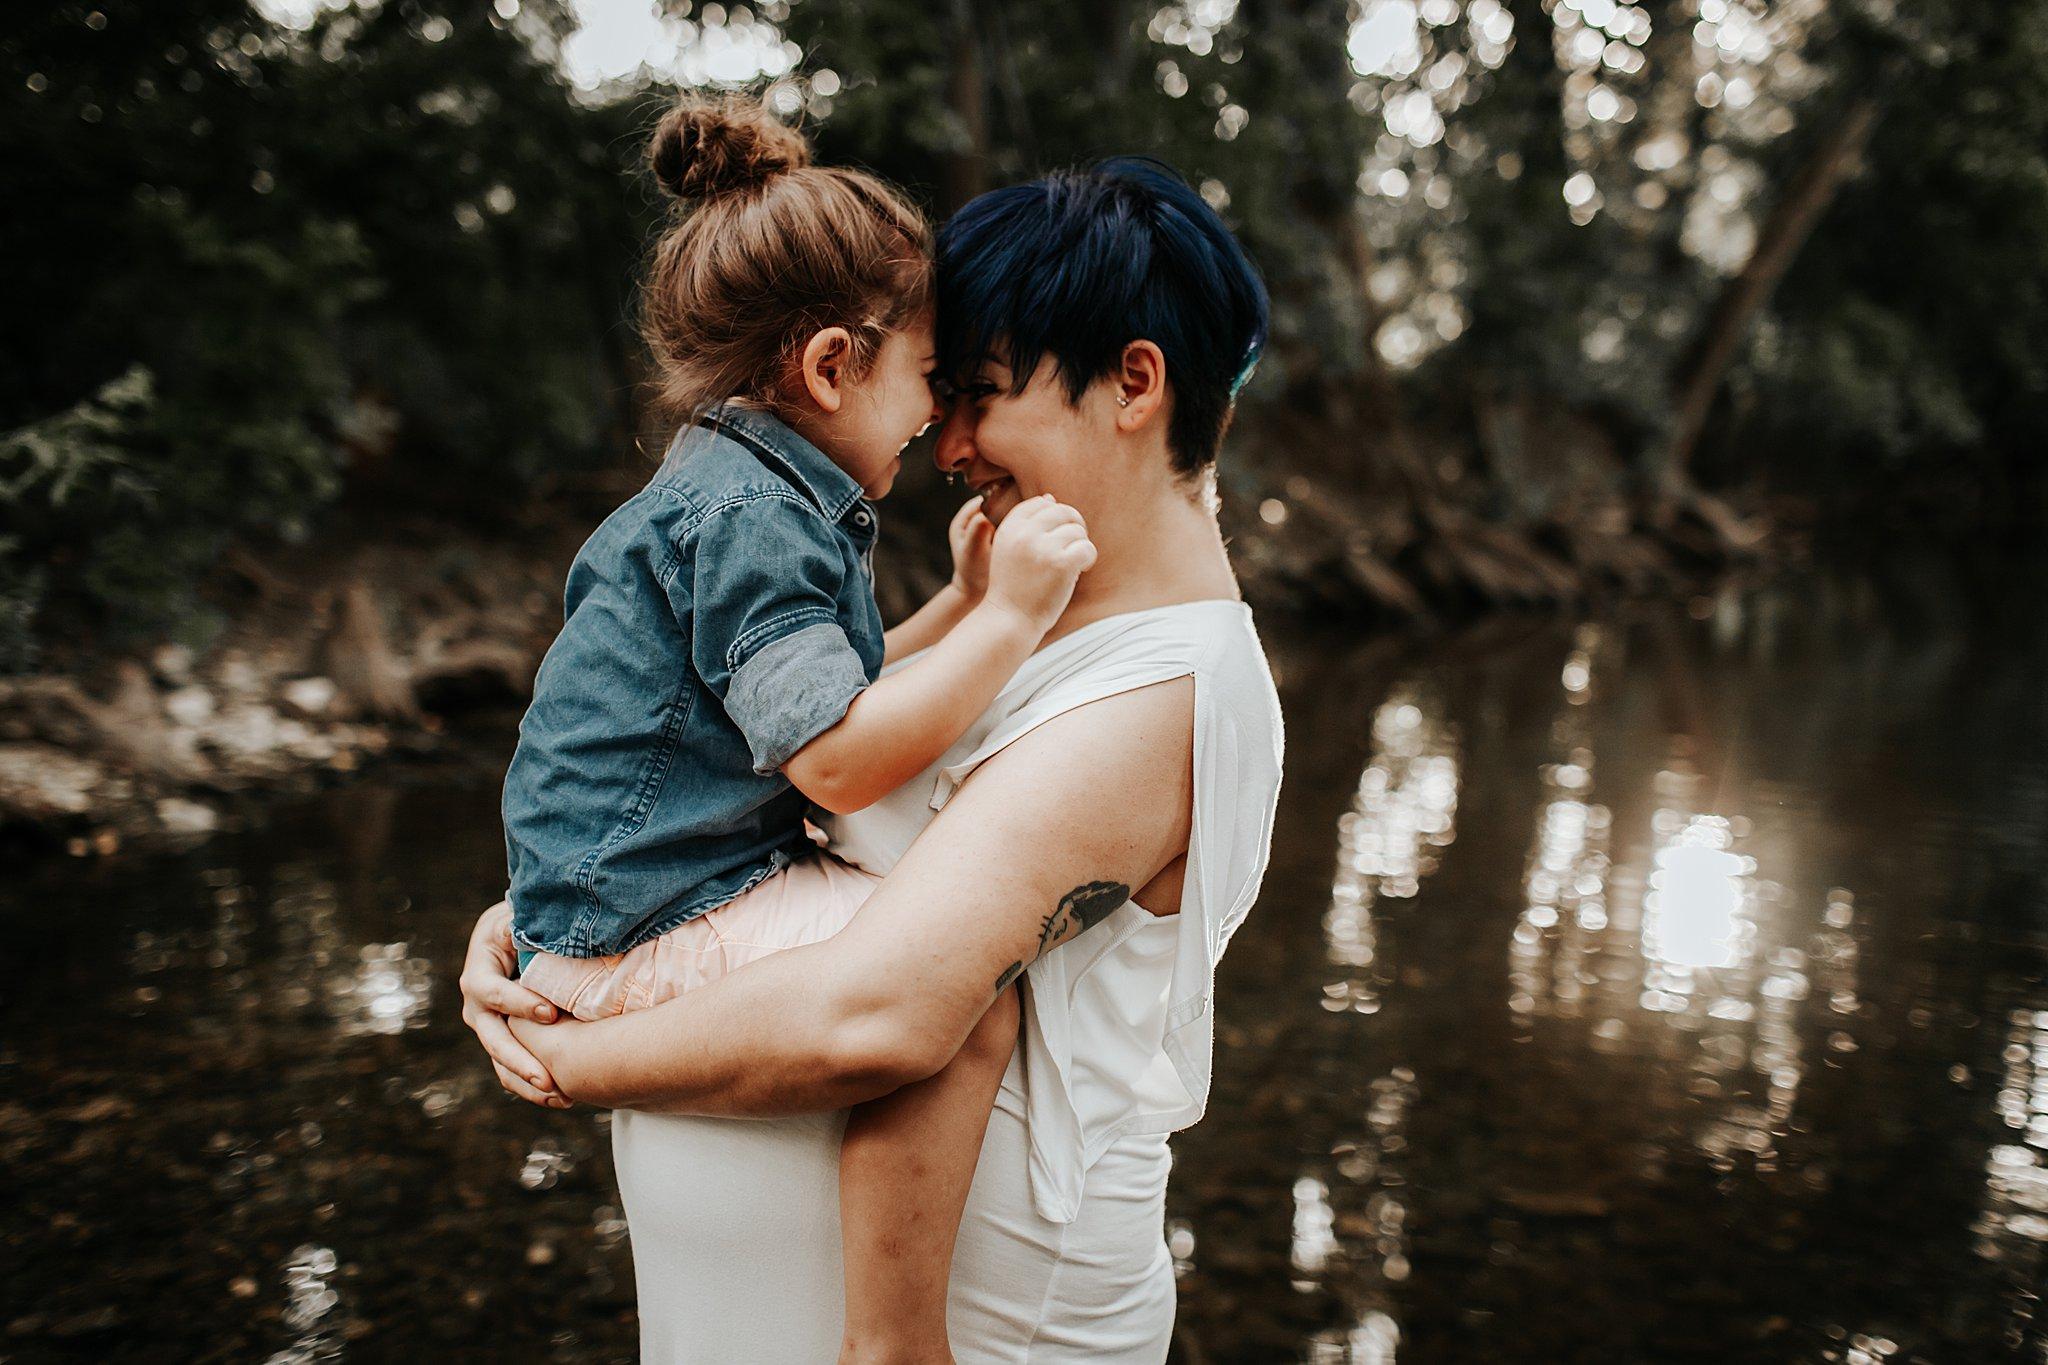 Meagan-San-Antonio-Maternity-Photographer-15_WEB.jpg